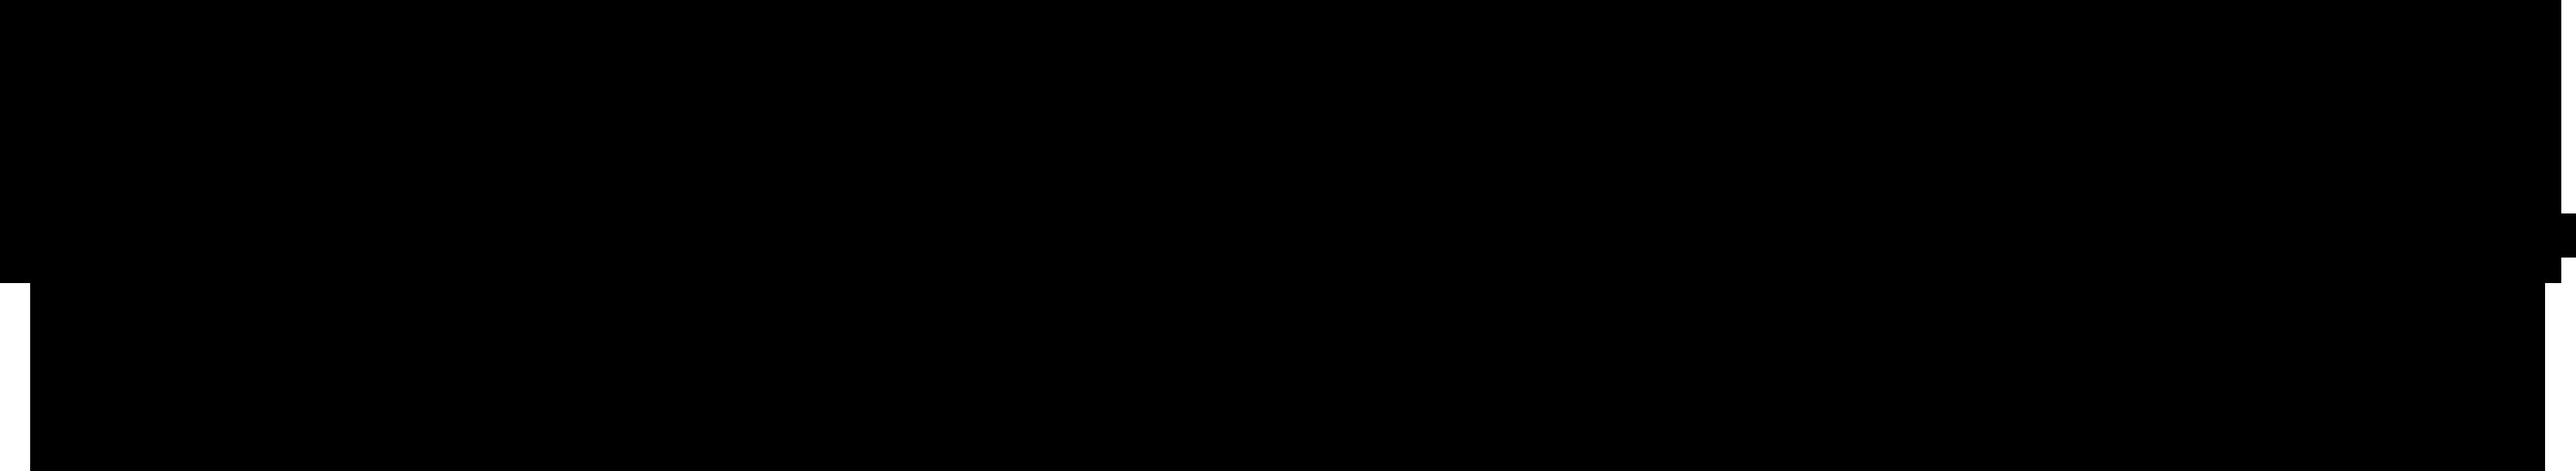 logo-biokoko-podmaz